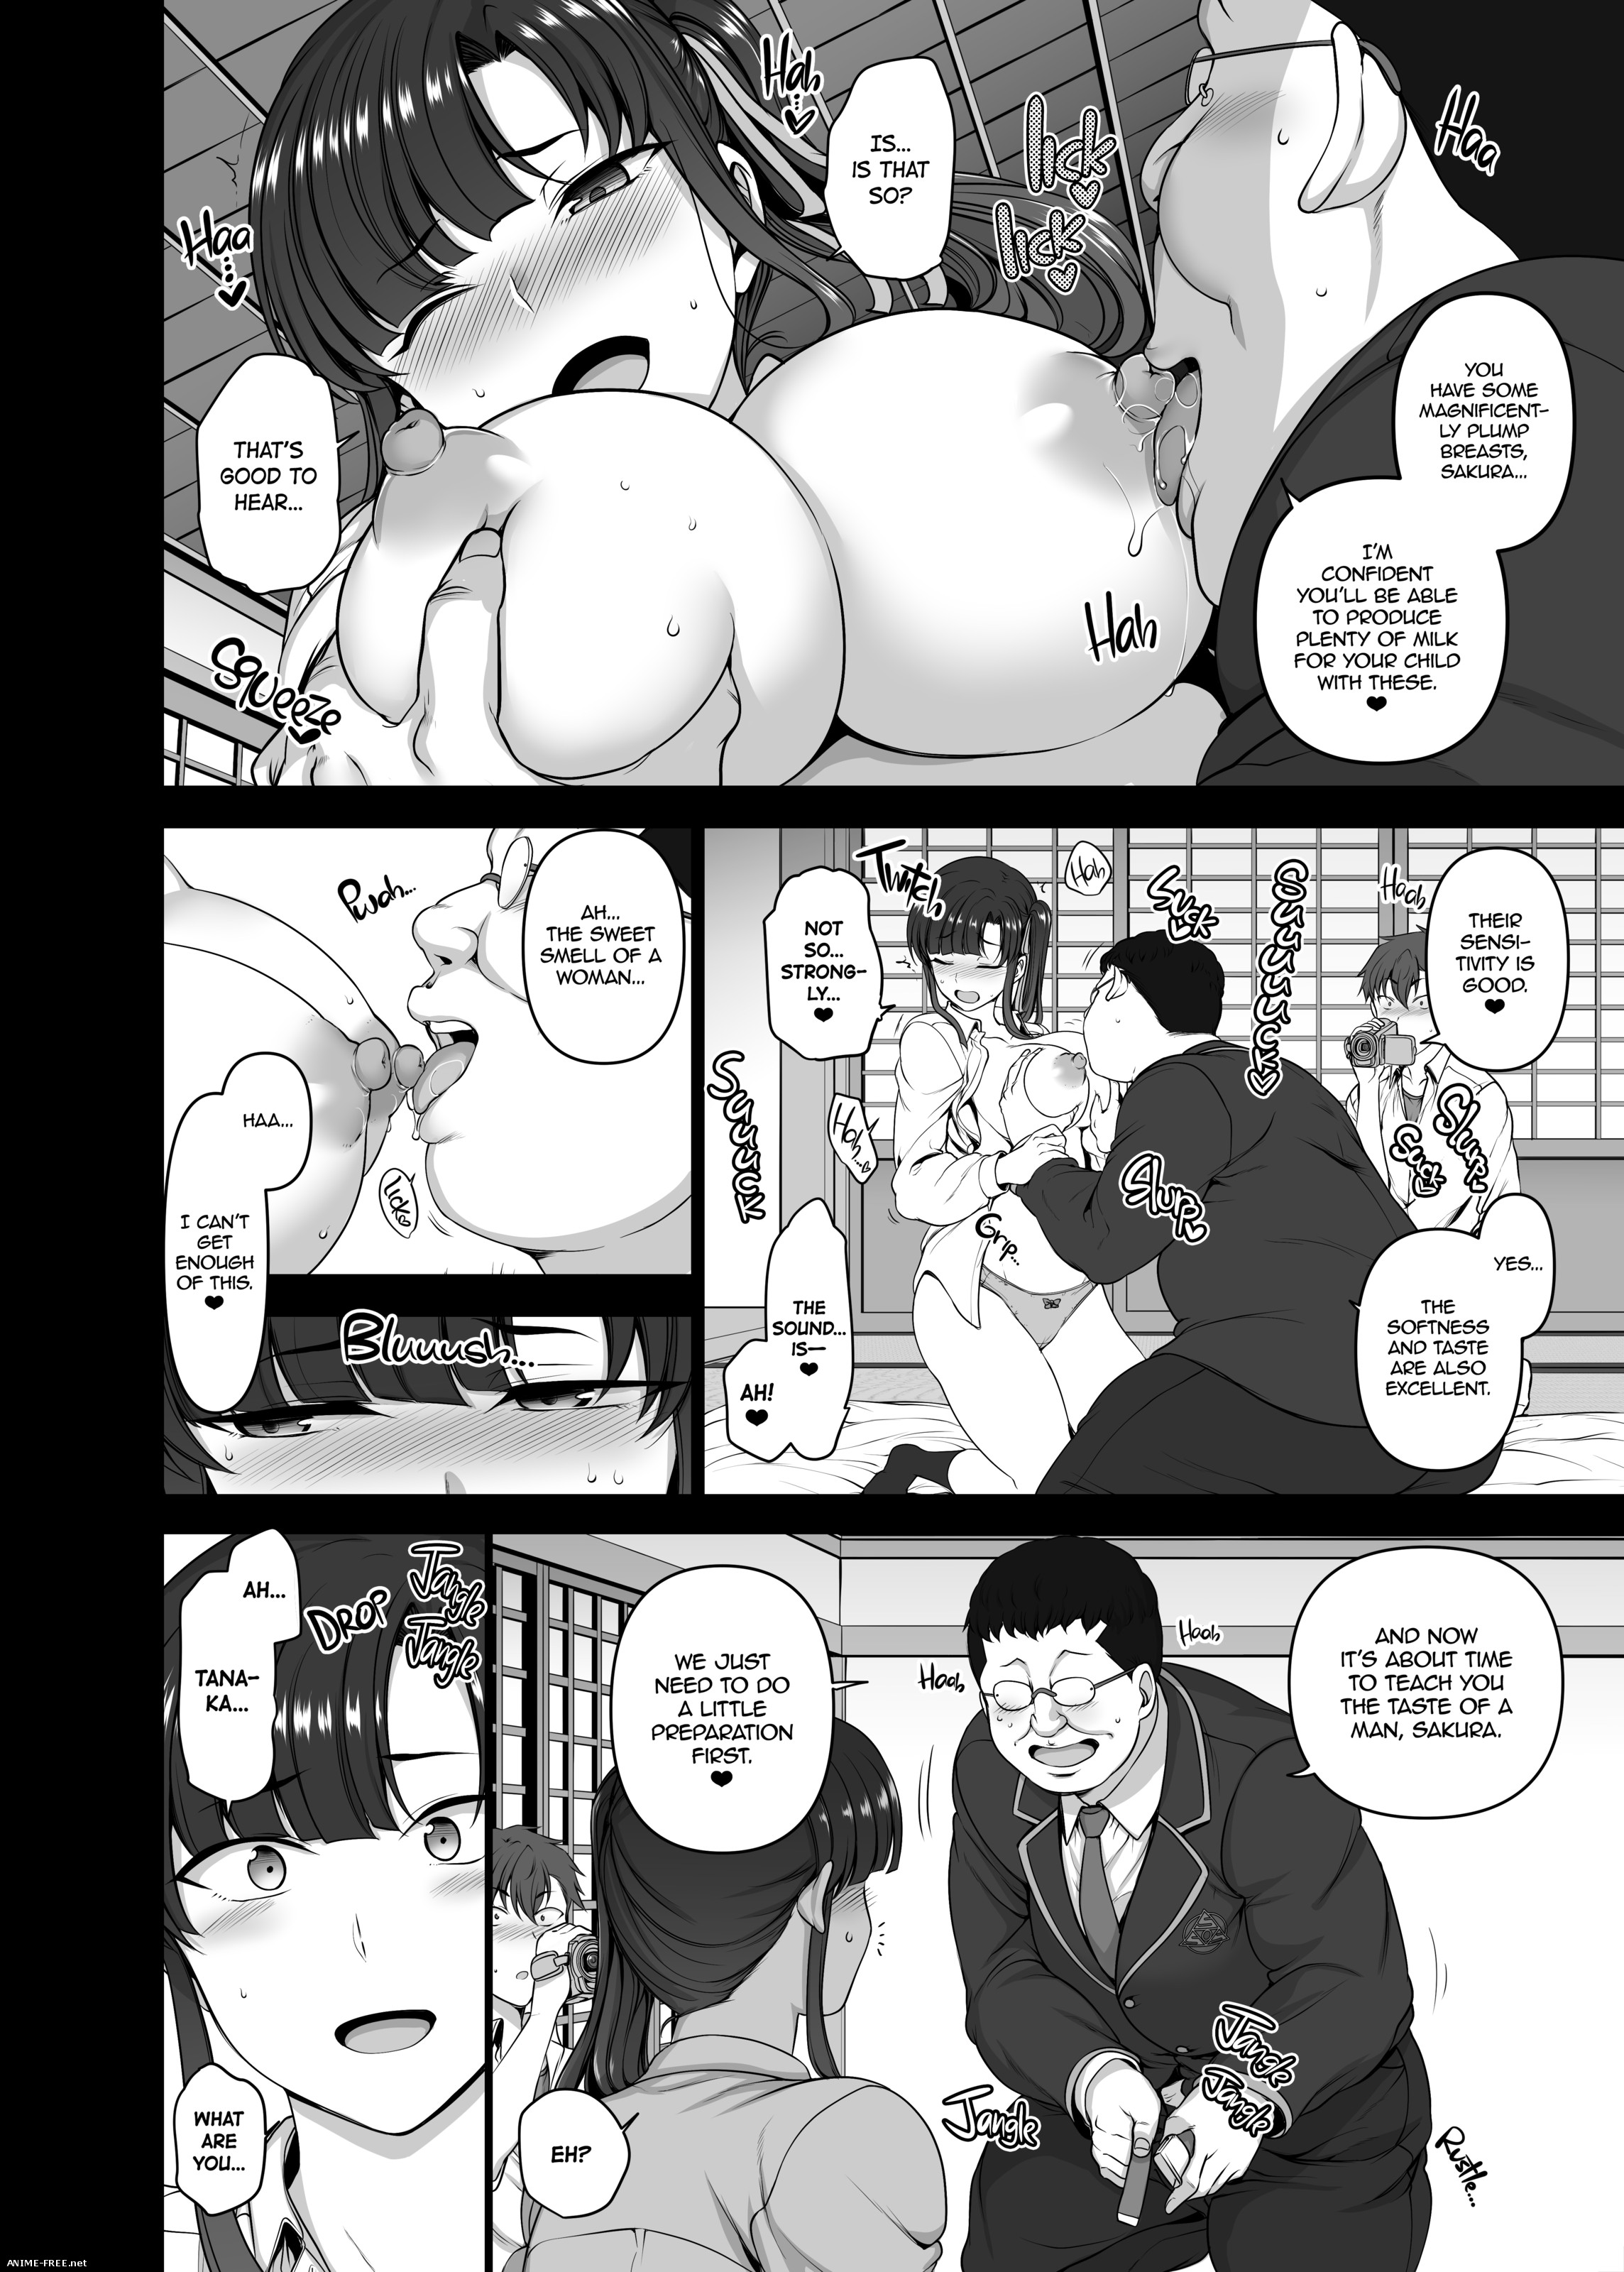 Aiue Oka (Collection) - Сборник хентай манги [Ptcen] [ENG,JAP] Manga Hentai